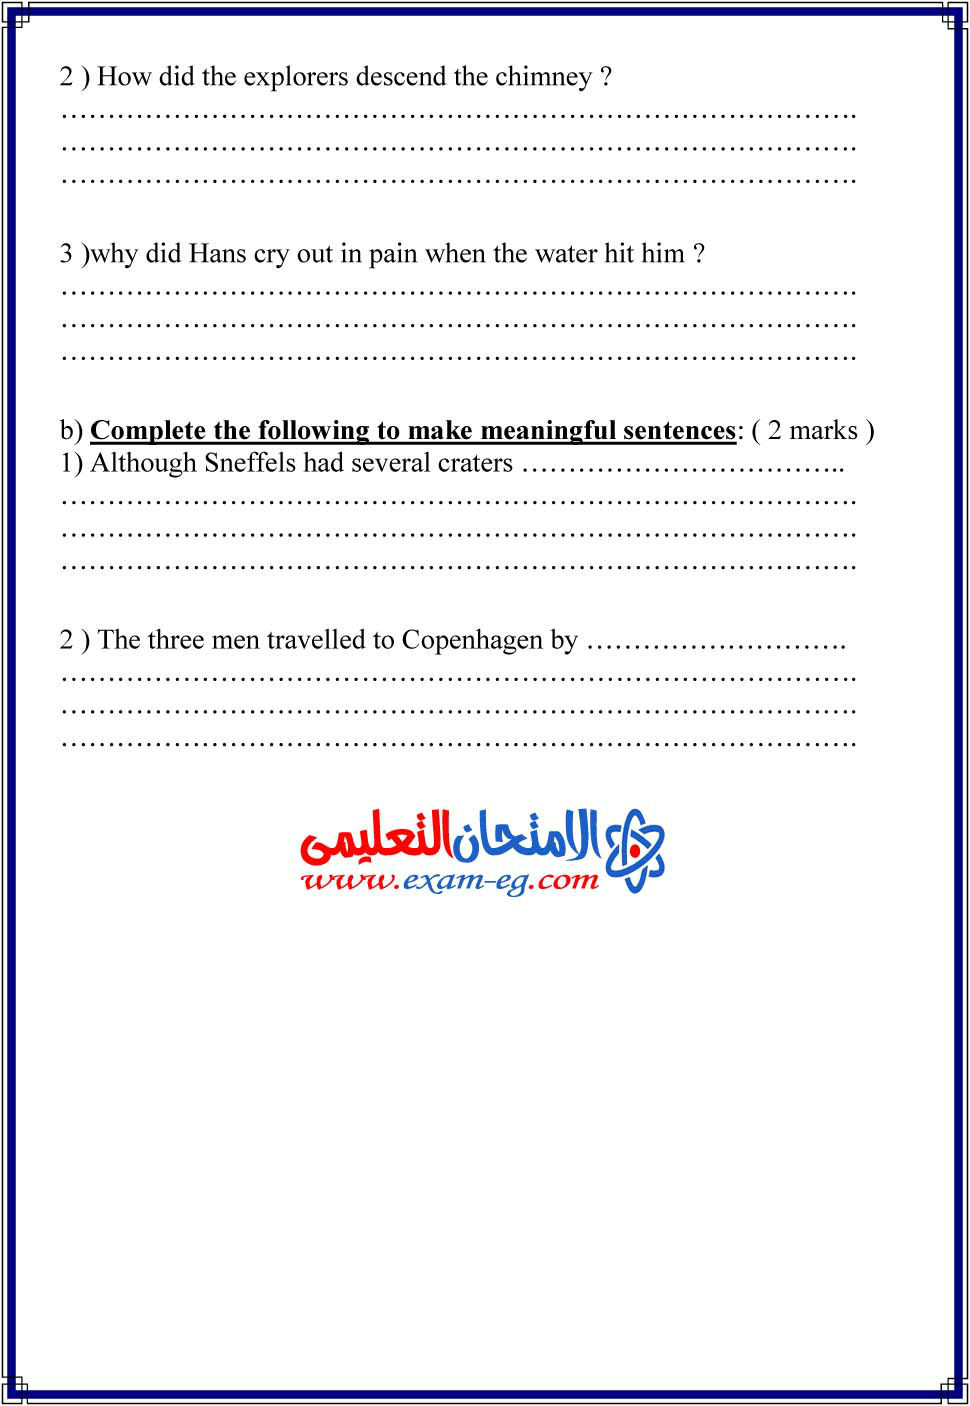 exam-eg.com_1396821132465.jpg